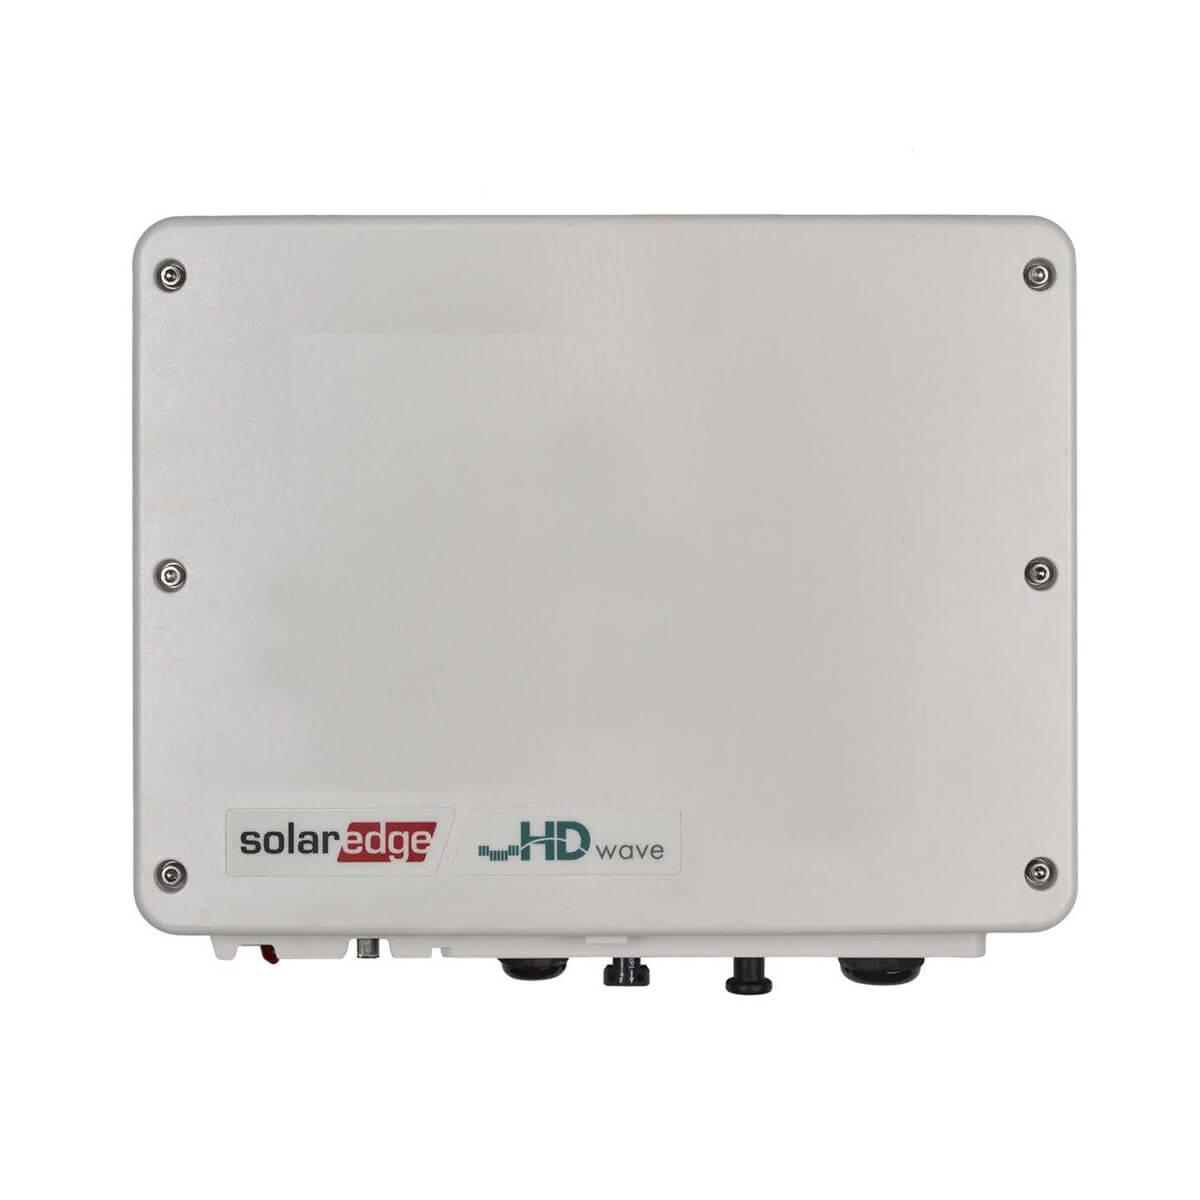 solaredge 2.2kW inverter, solaredge se2200h 2.2kW inverter, solaredge se2200h inverter, solaredge se2200h, solaredge 2.2 kW